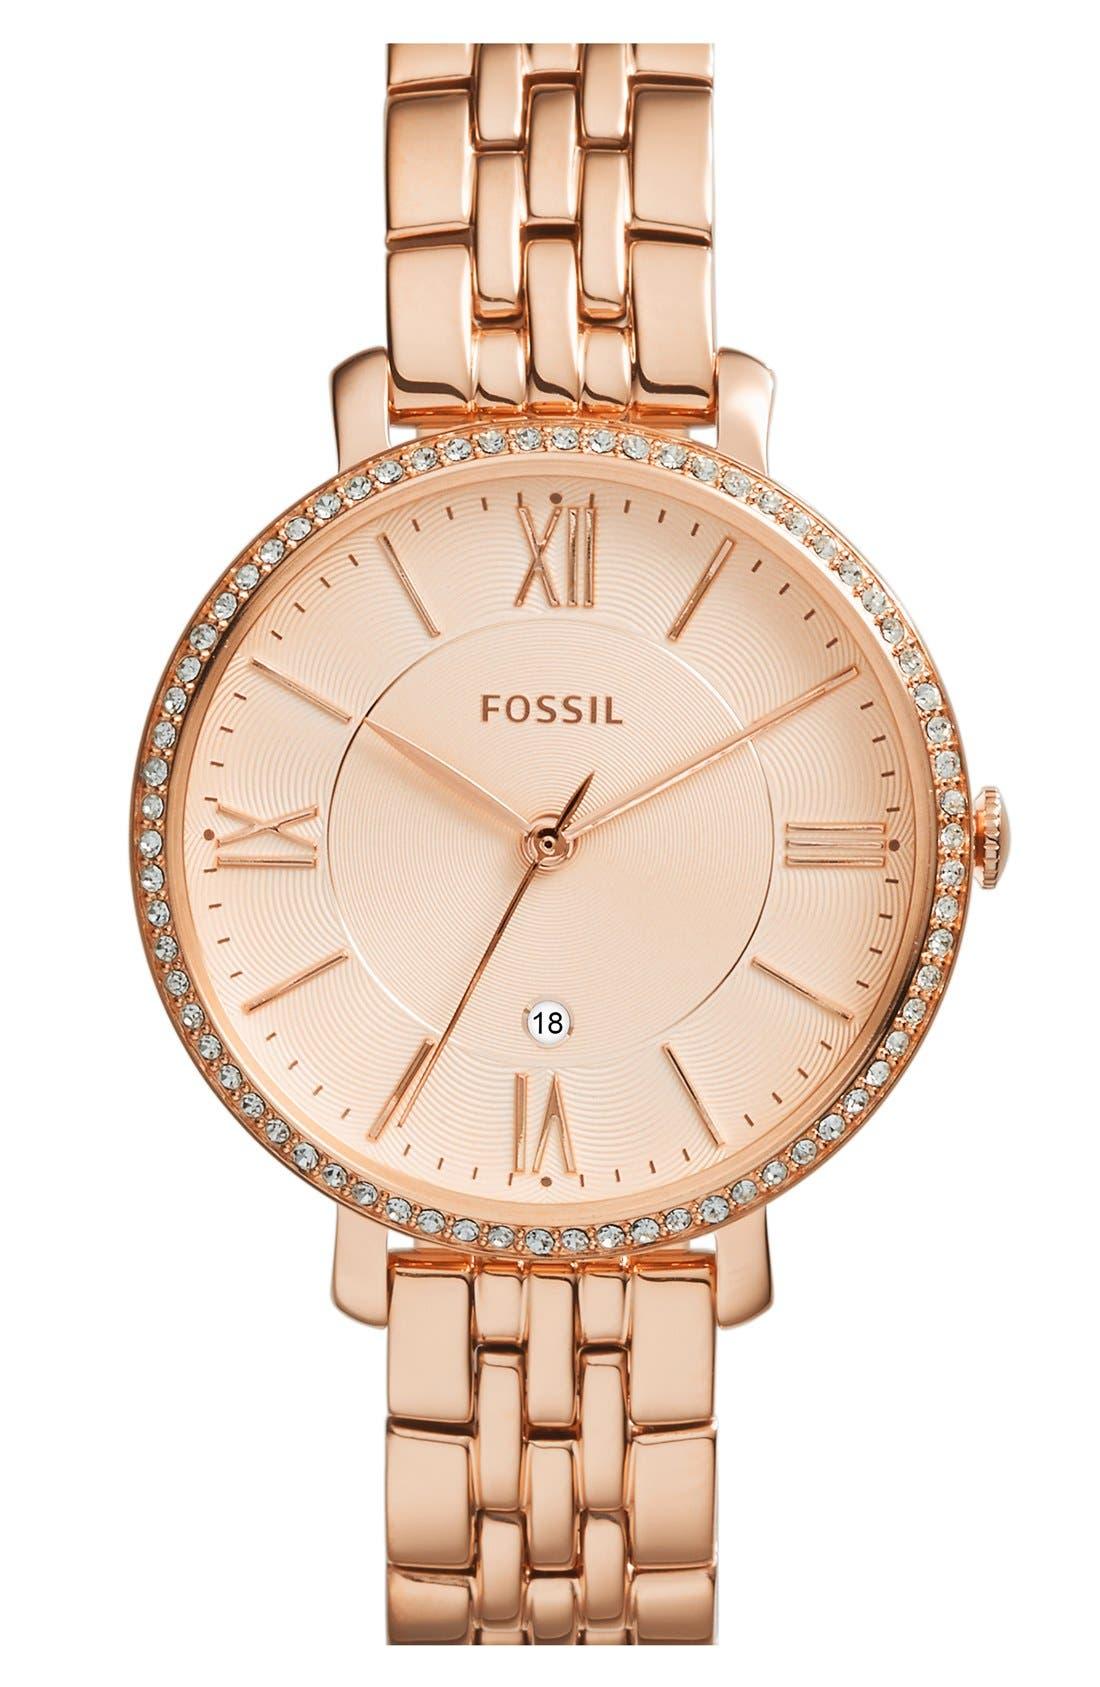 Main Image - Fossil 'Jacqueline' Crystal Bezel Bracelet Watch, 36mm (Nordstrom Exclusive)